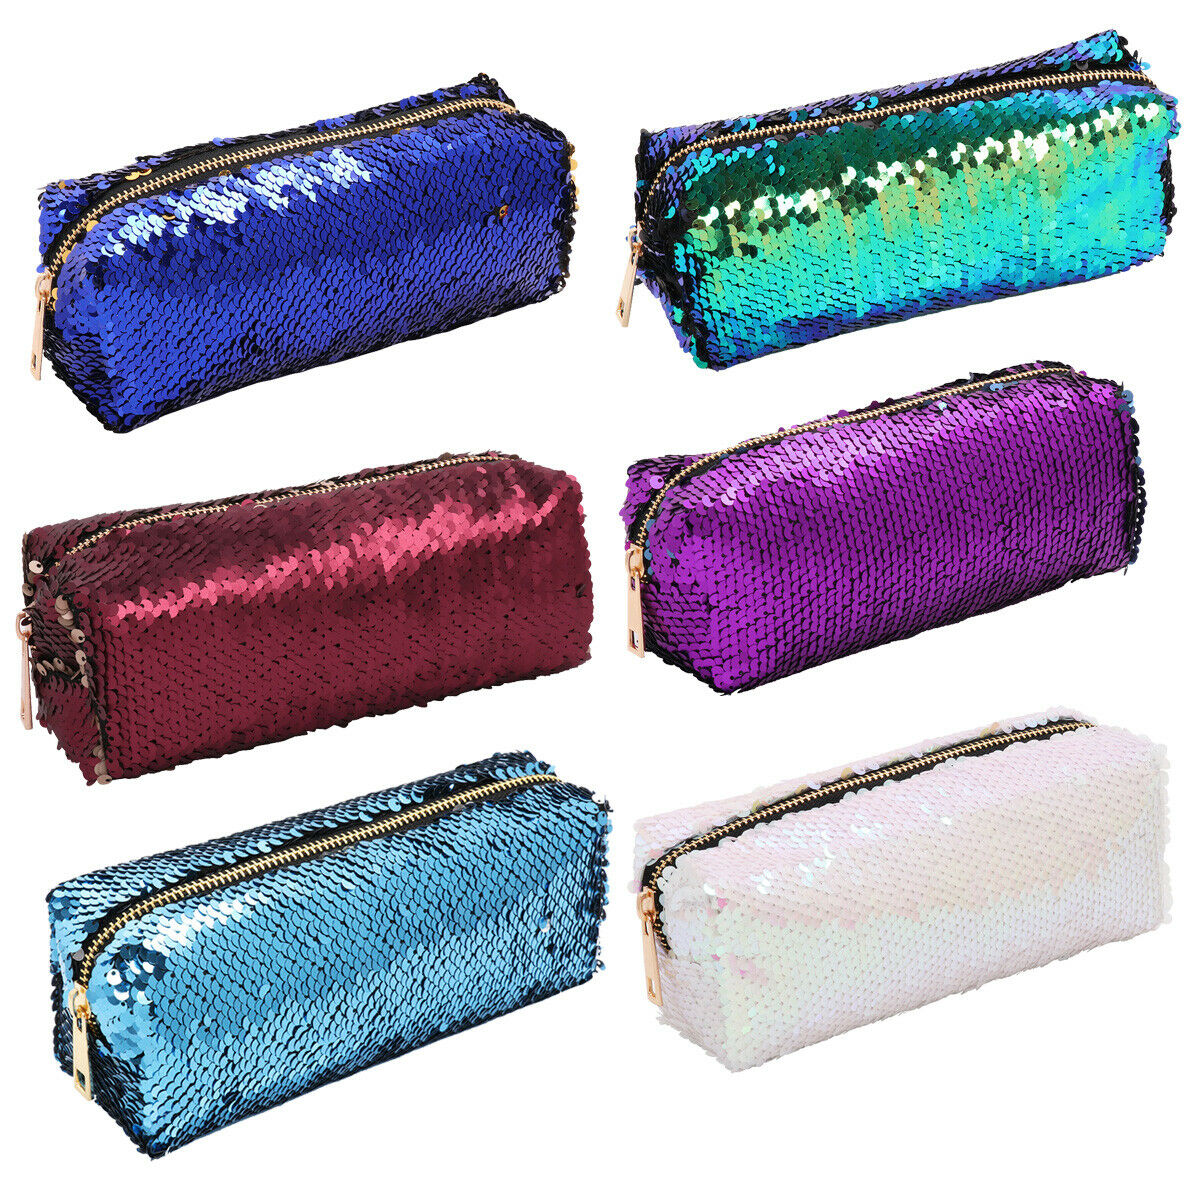 Reversible Double Color Cosmetic Bag Mermaid Sequin Handbags Pencil_Pouch Case